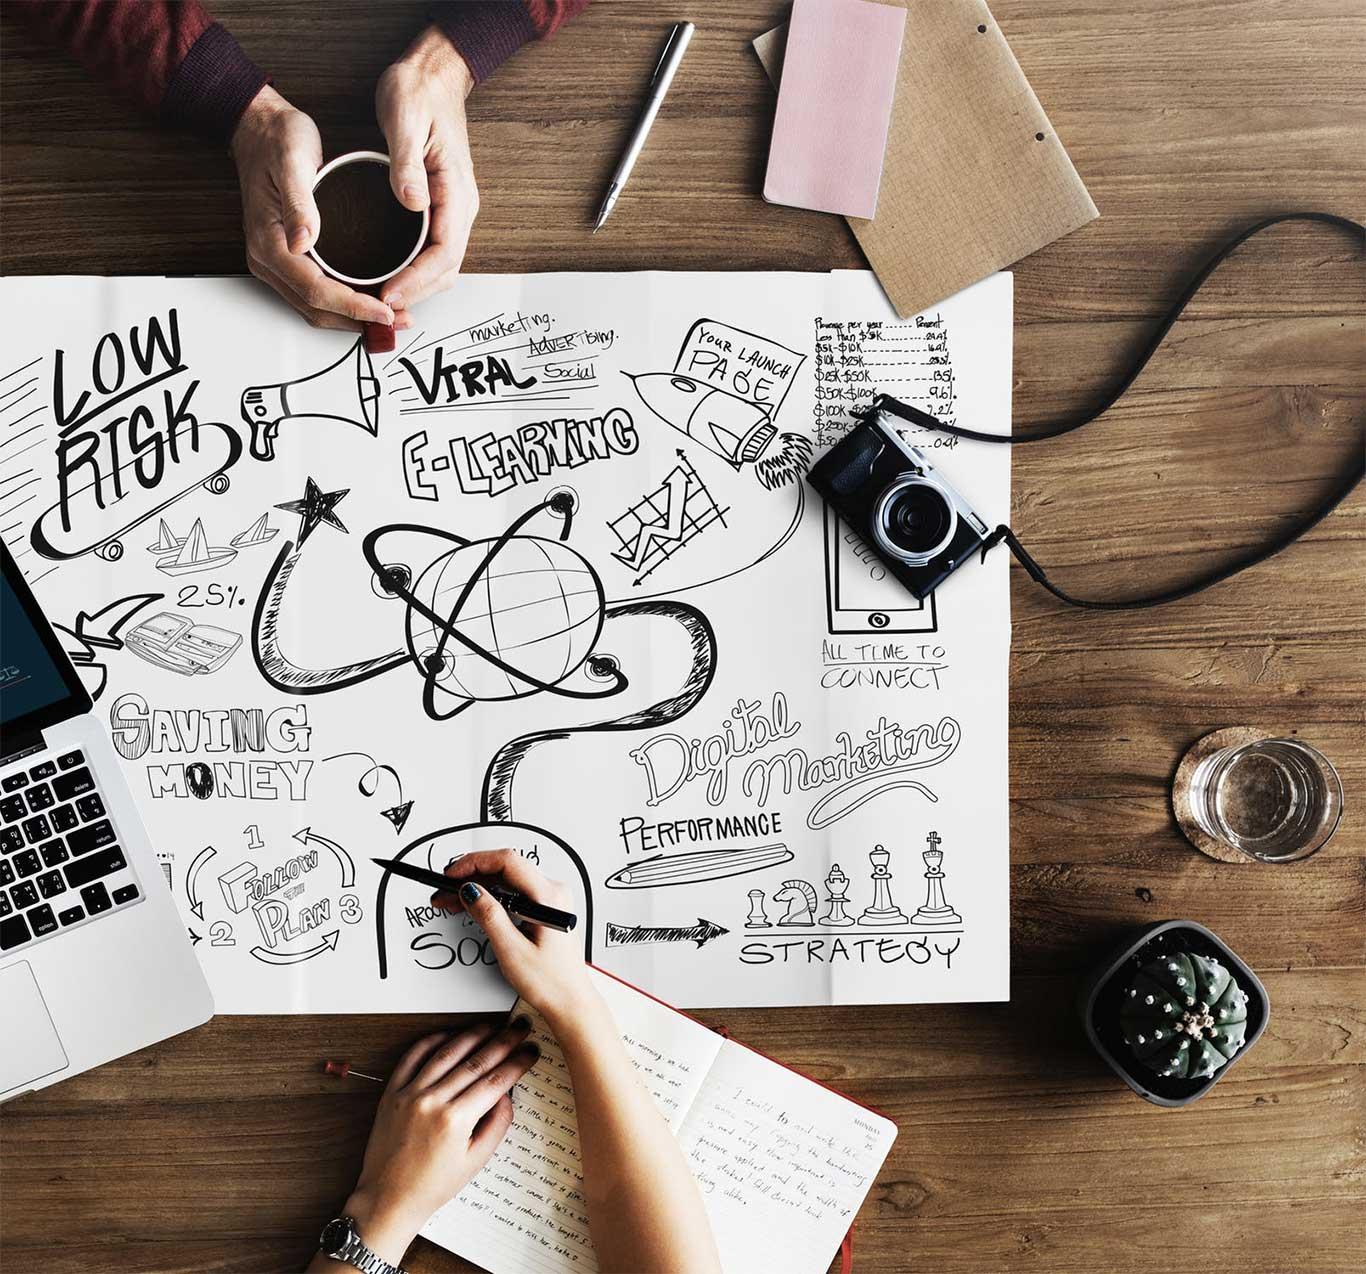 Grafisk design brainstorming på et papir